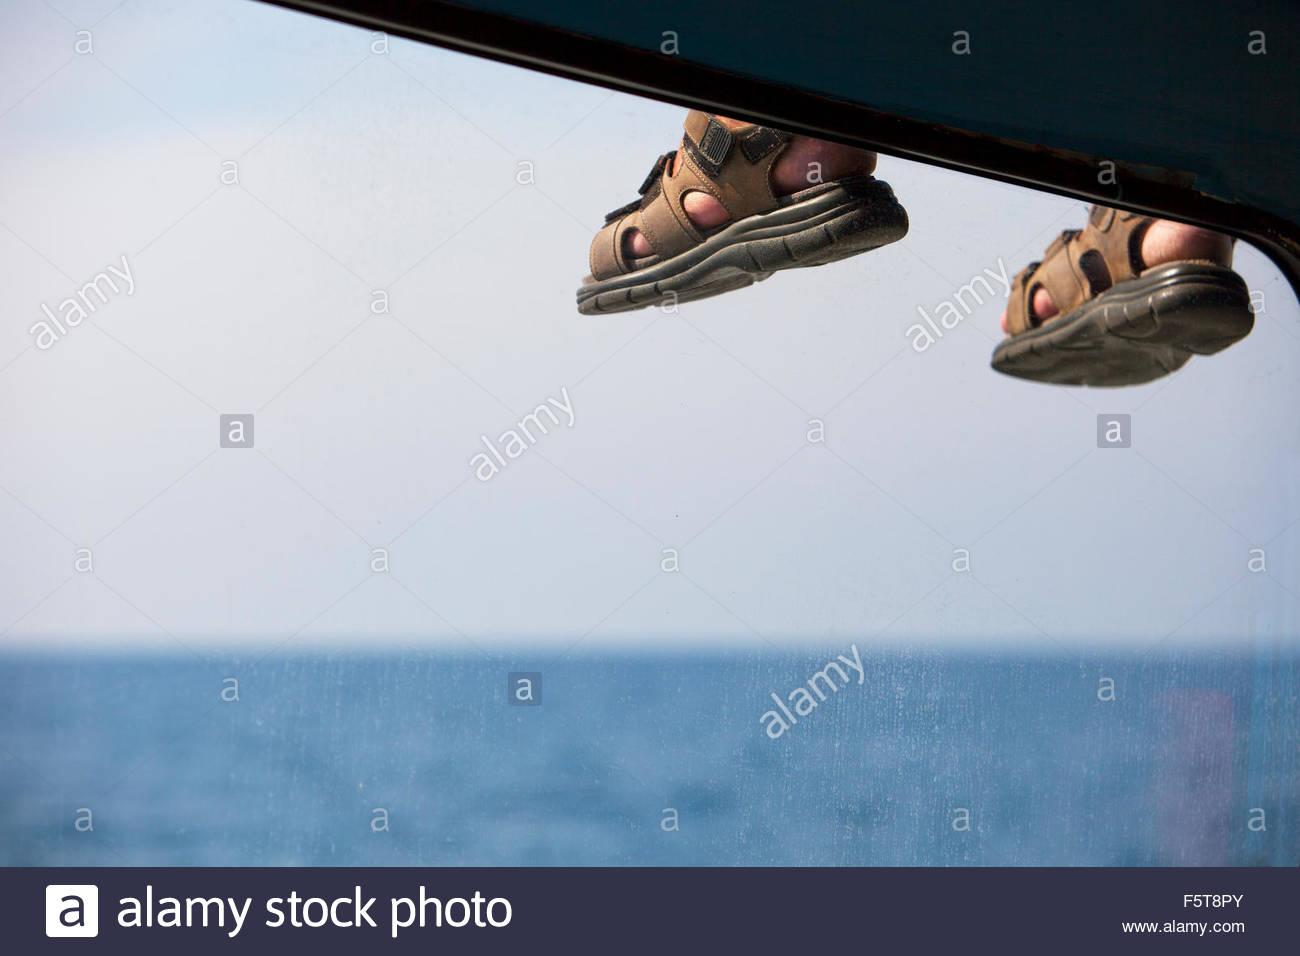 Thailand, Phuket, Thaimaa, Feet of person sitting on roof of vehicle - Stock Image